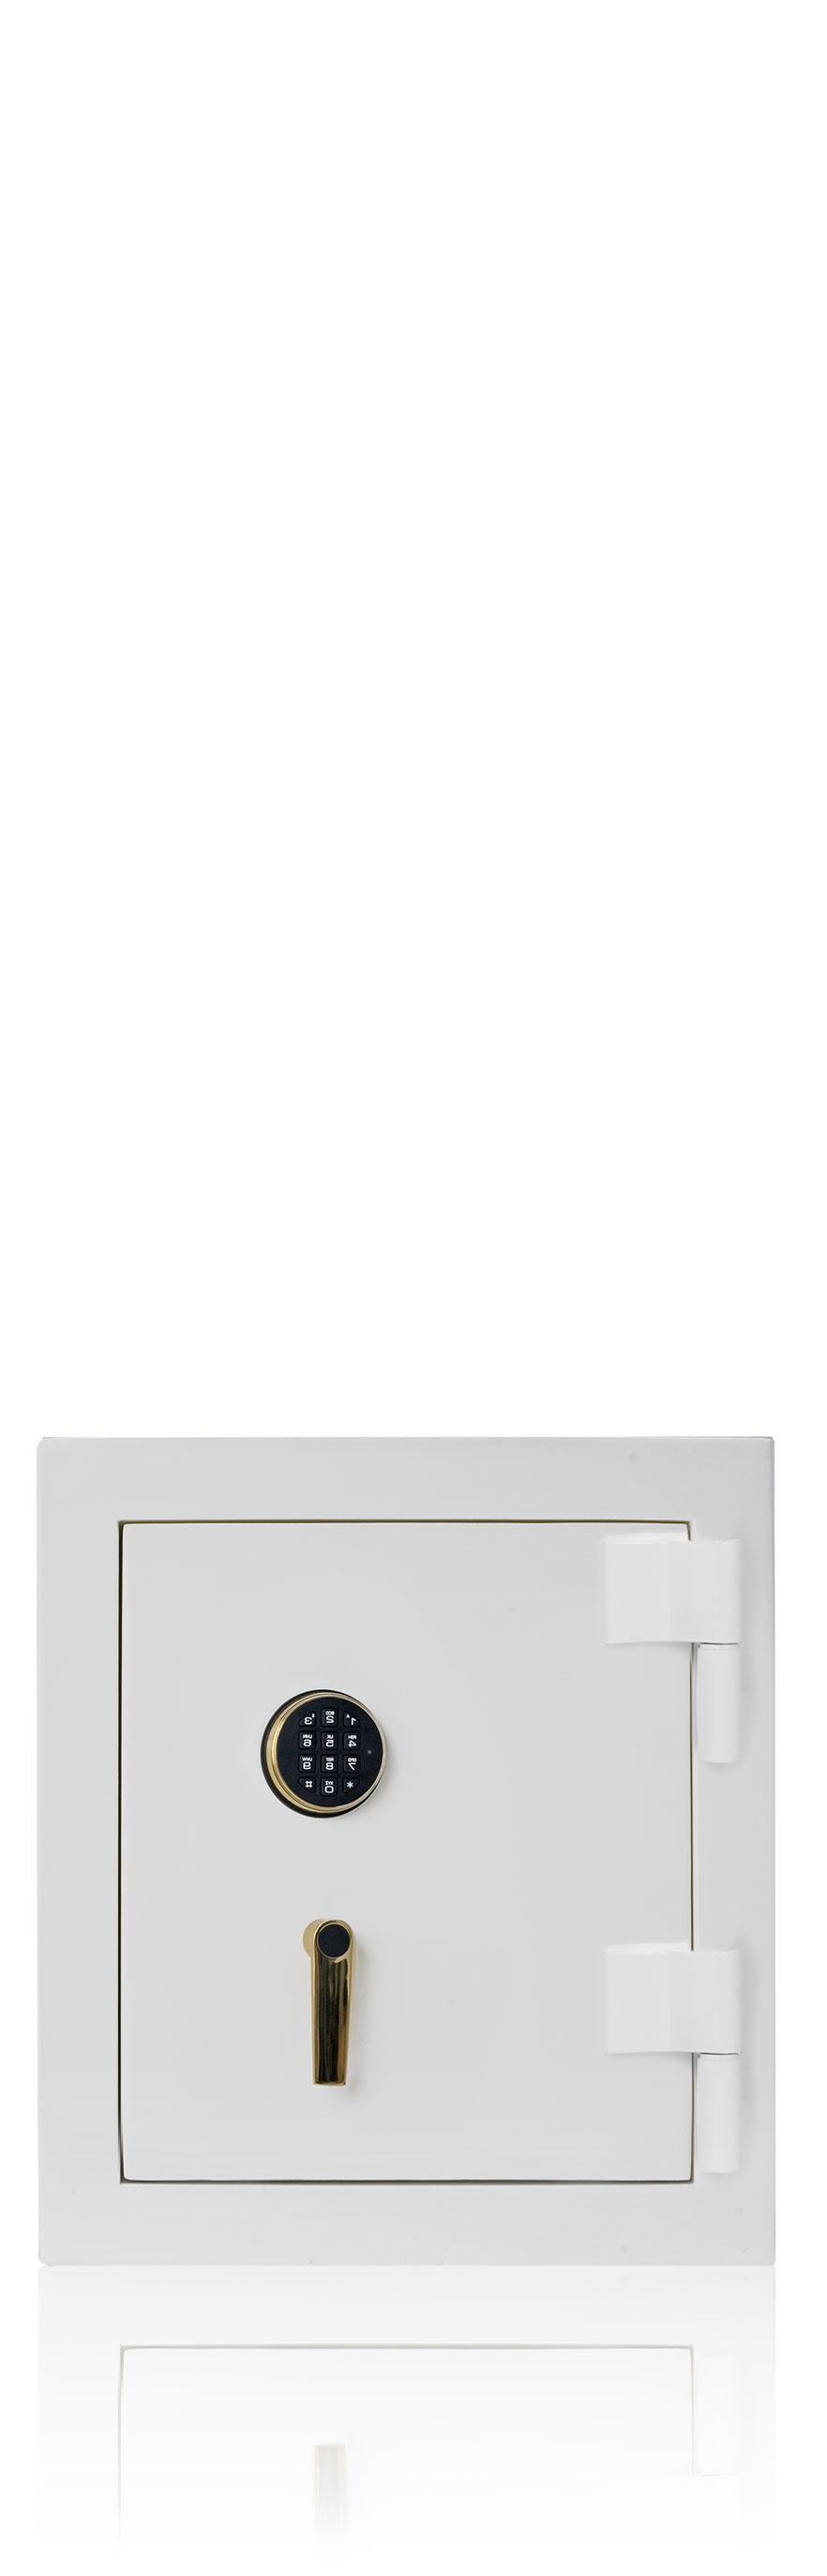 Jewelry Safe Luxury Safes Brown Manufacturing Inc Lighting Diagram Gem 2418